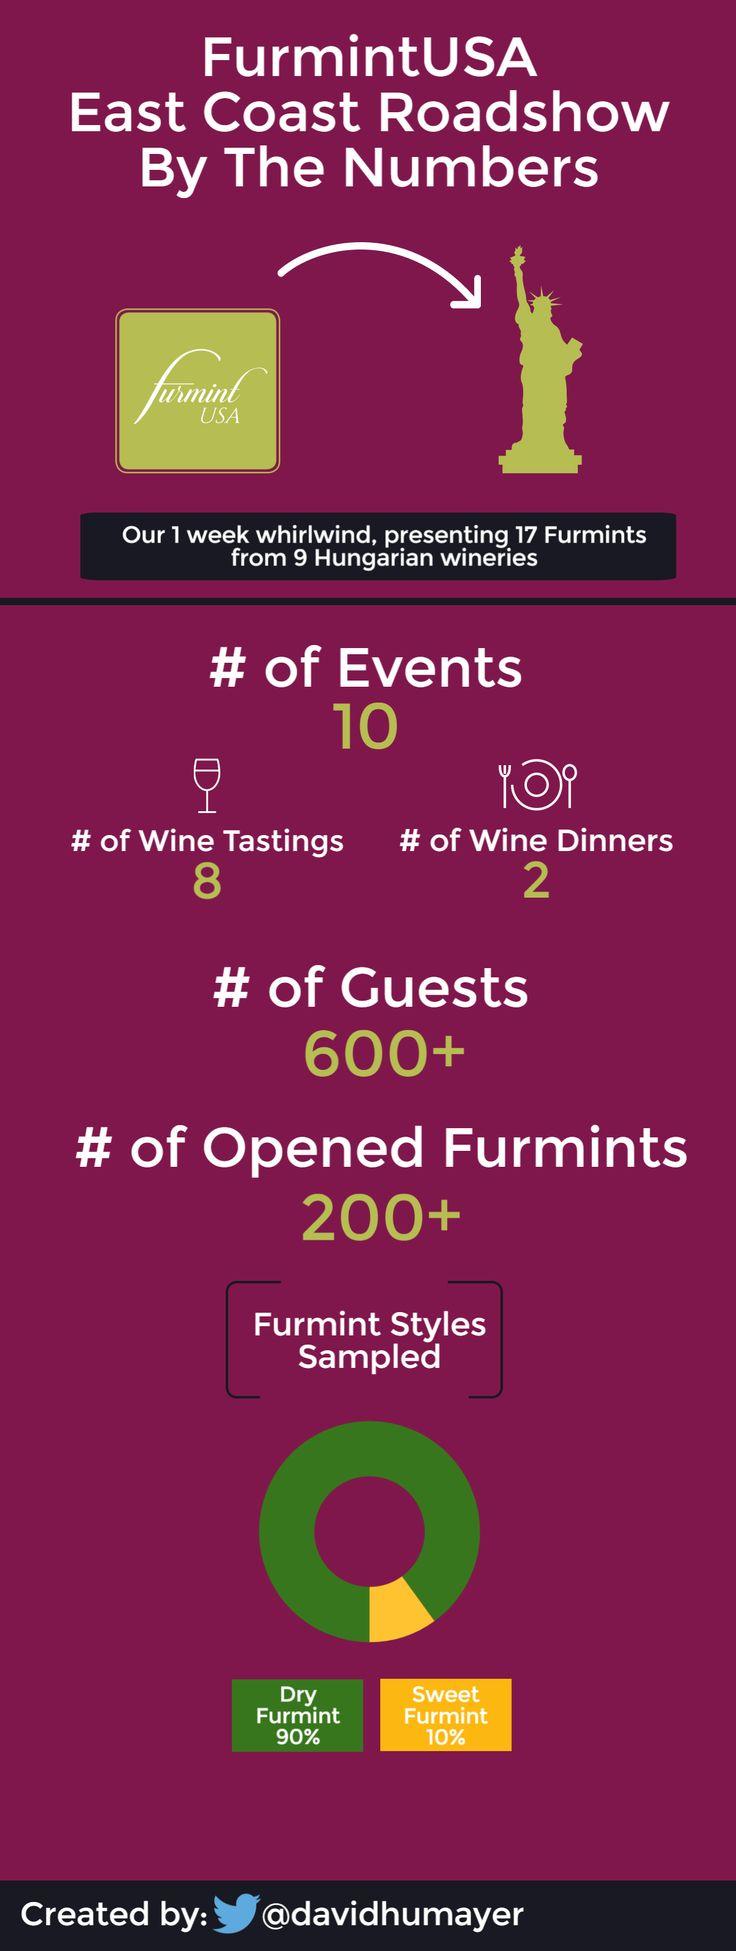 A quick summary of the #EastCoast FurmintUSA #Roadshow. #infographic